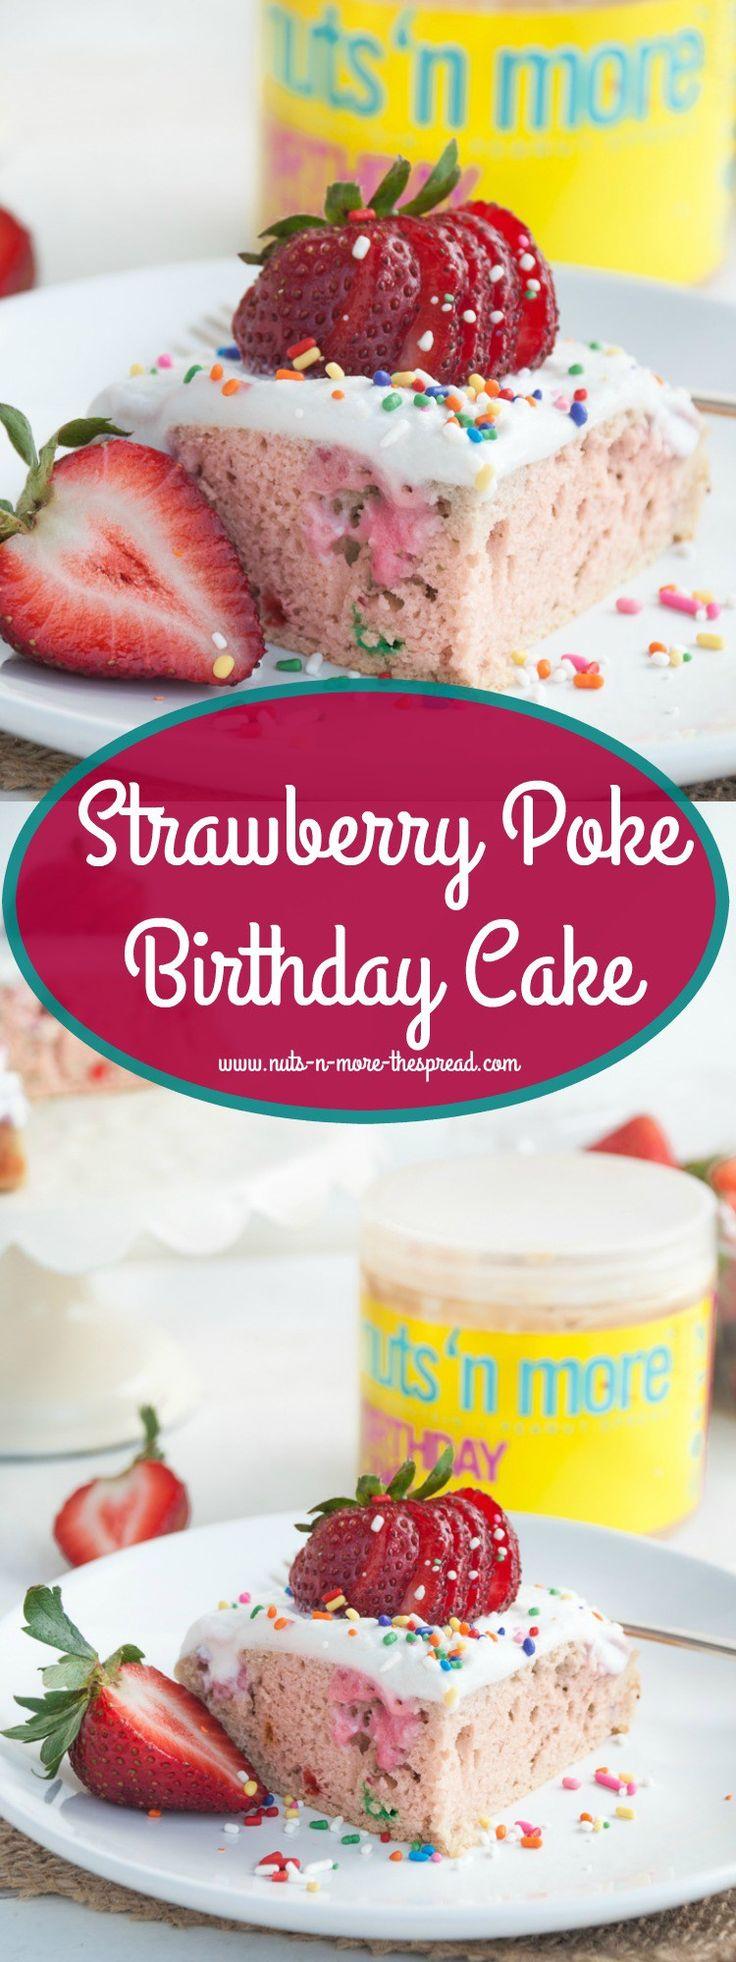 Strawberry Poke Birthday Cake Peanut Butter